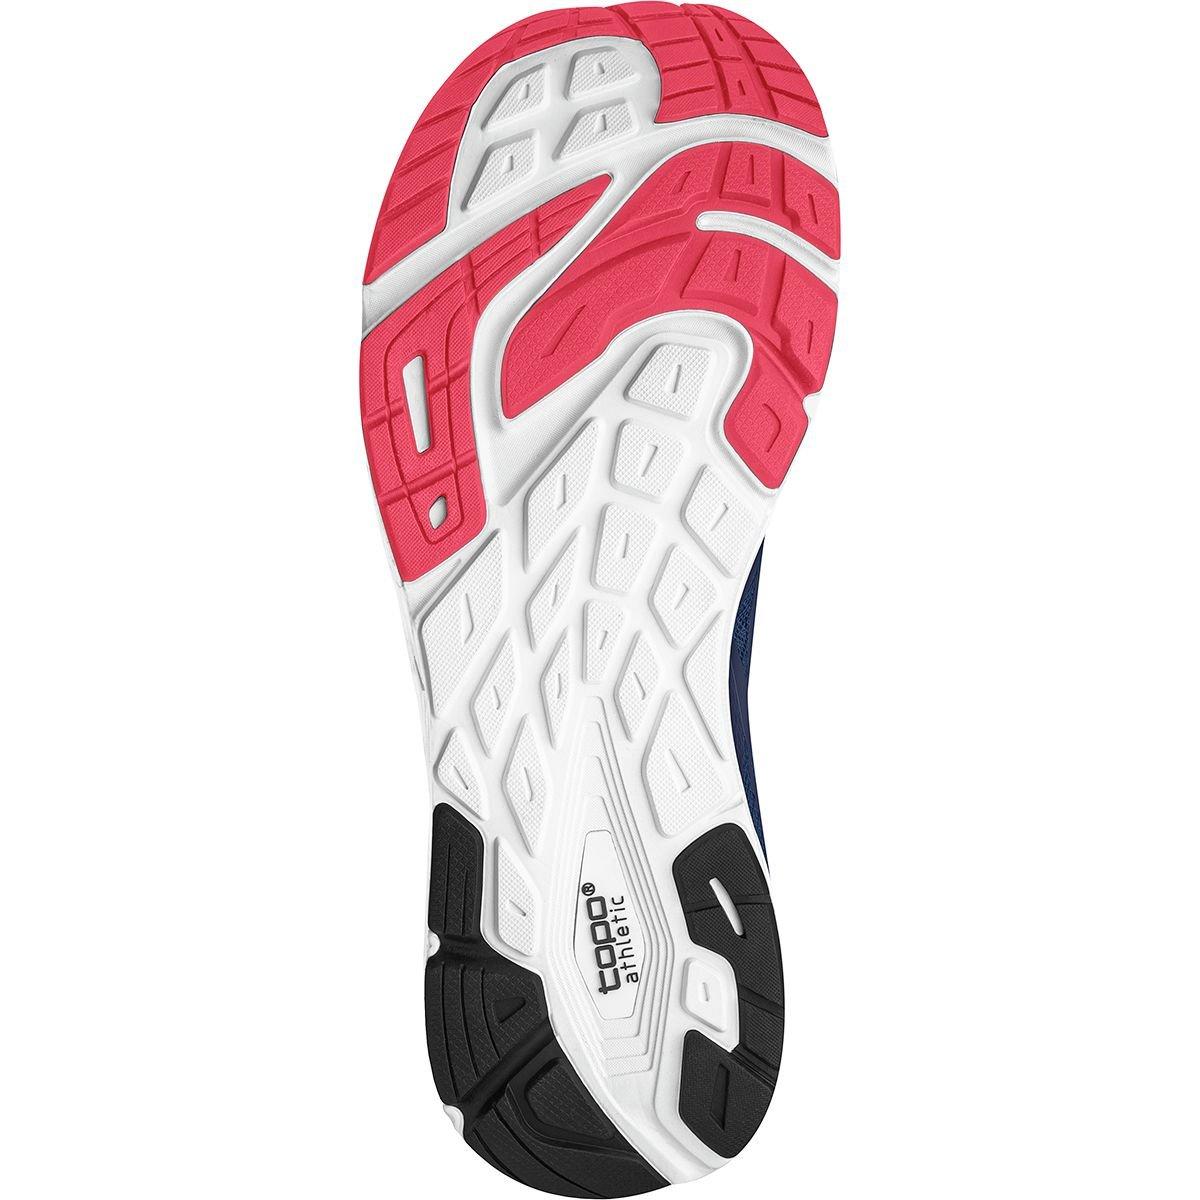 Topo Athletic Magnifly 7 2 Running Shoes - Women's B074JHFJGW 7 Magnifly B(M) US|Navy/Pink 1d3b33